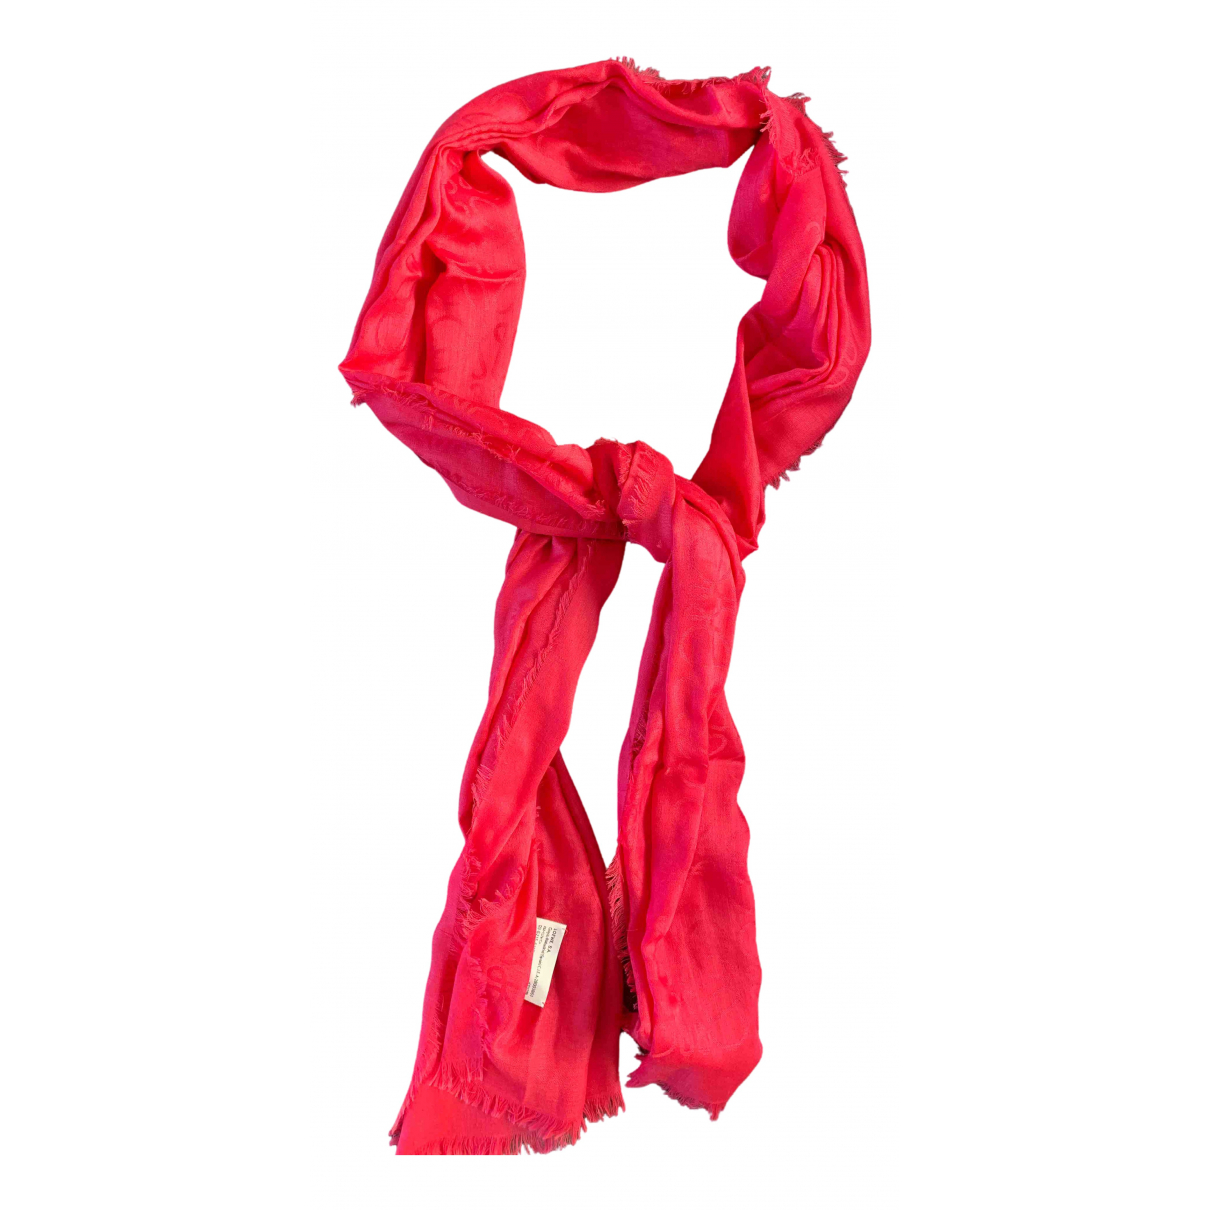 Loewe - Foulard   pour femme en cachemire - rose